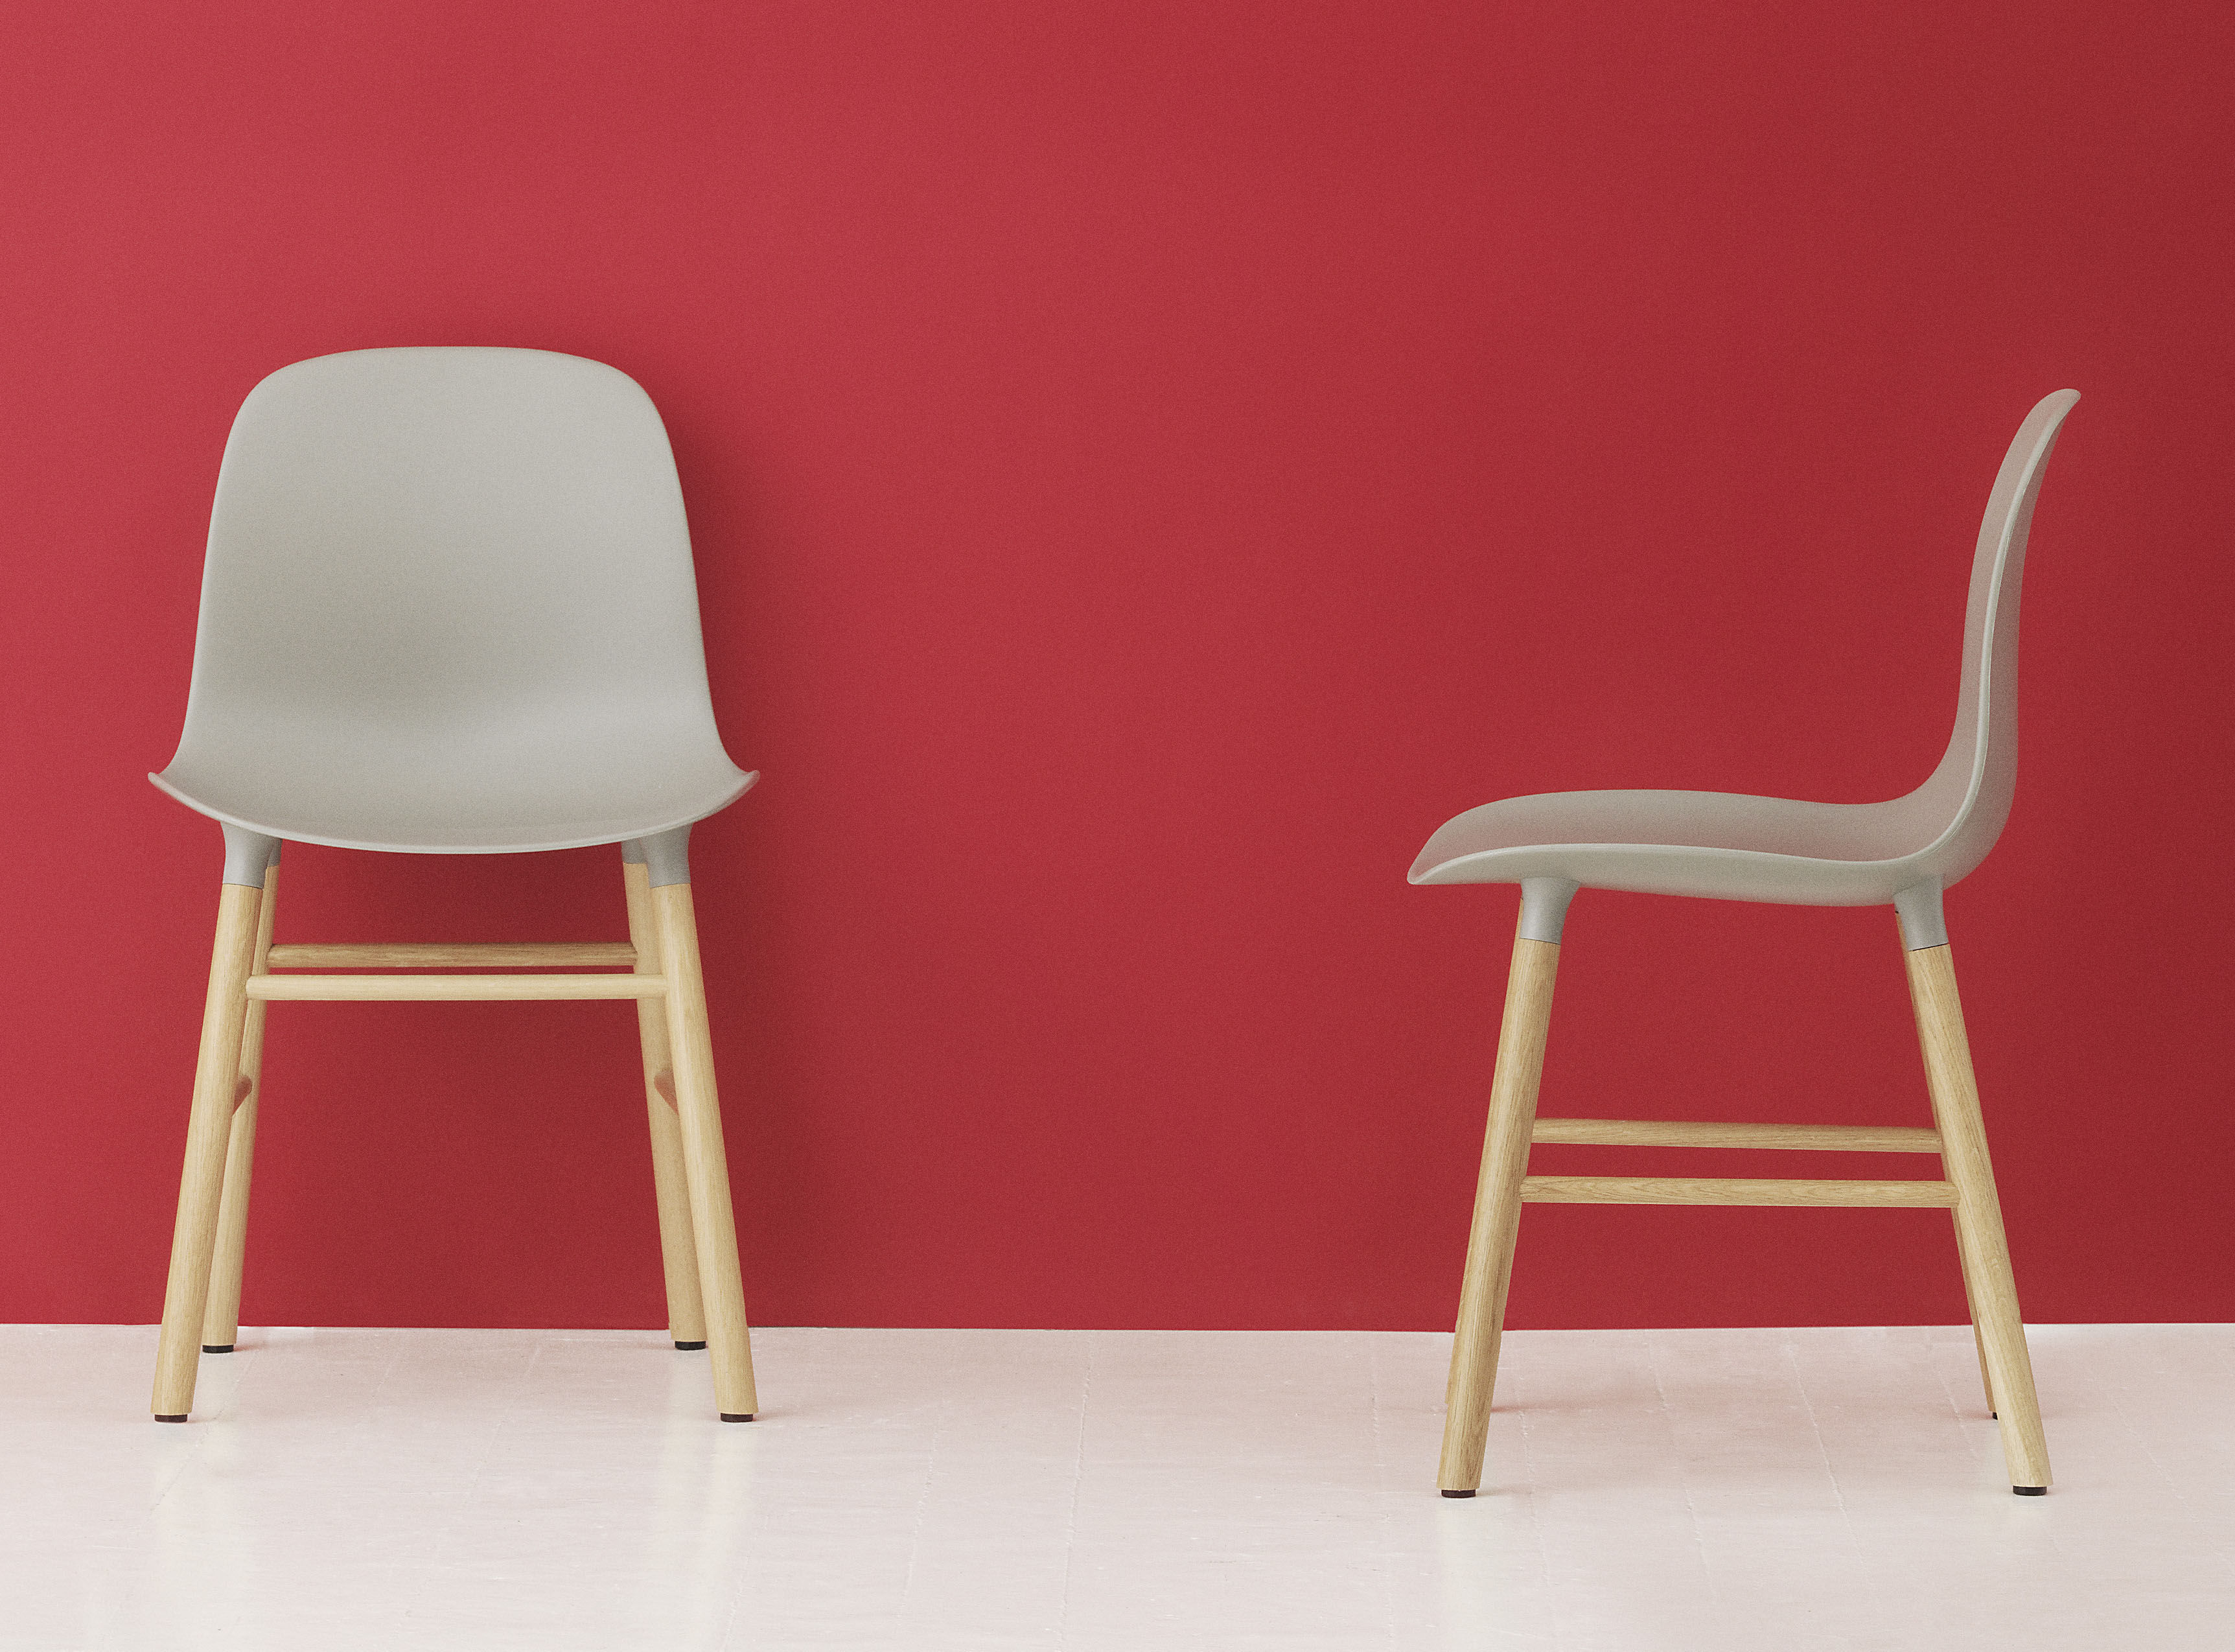 Stuhl Form von Normann Copenhagen Grau Holz natur